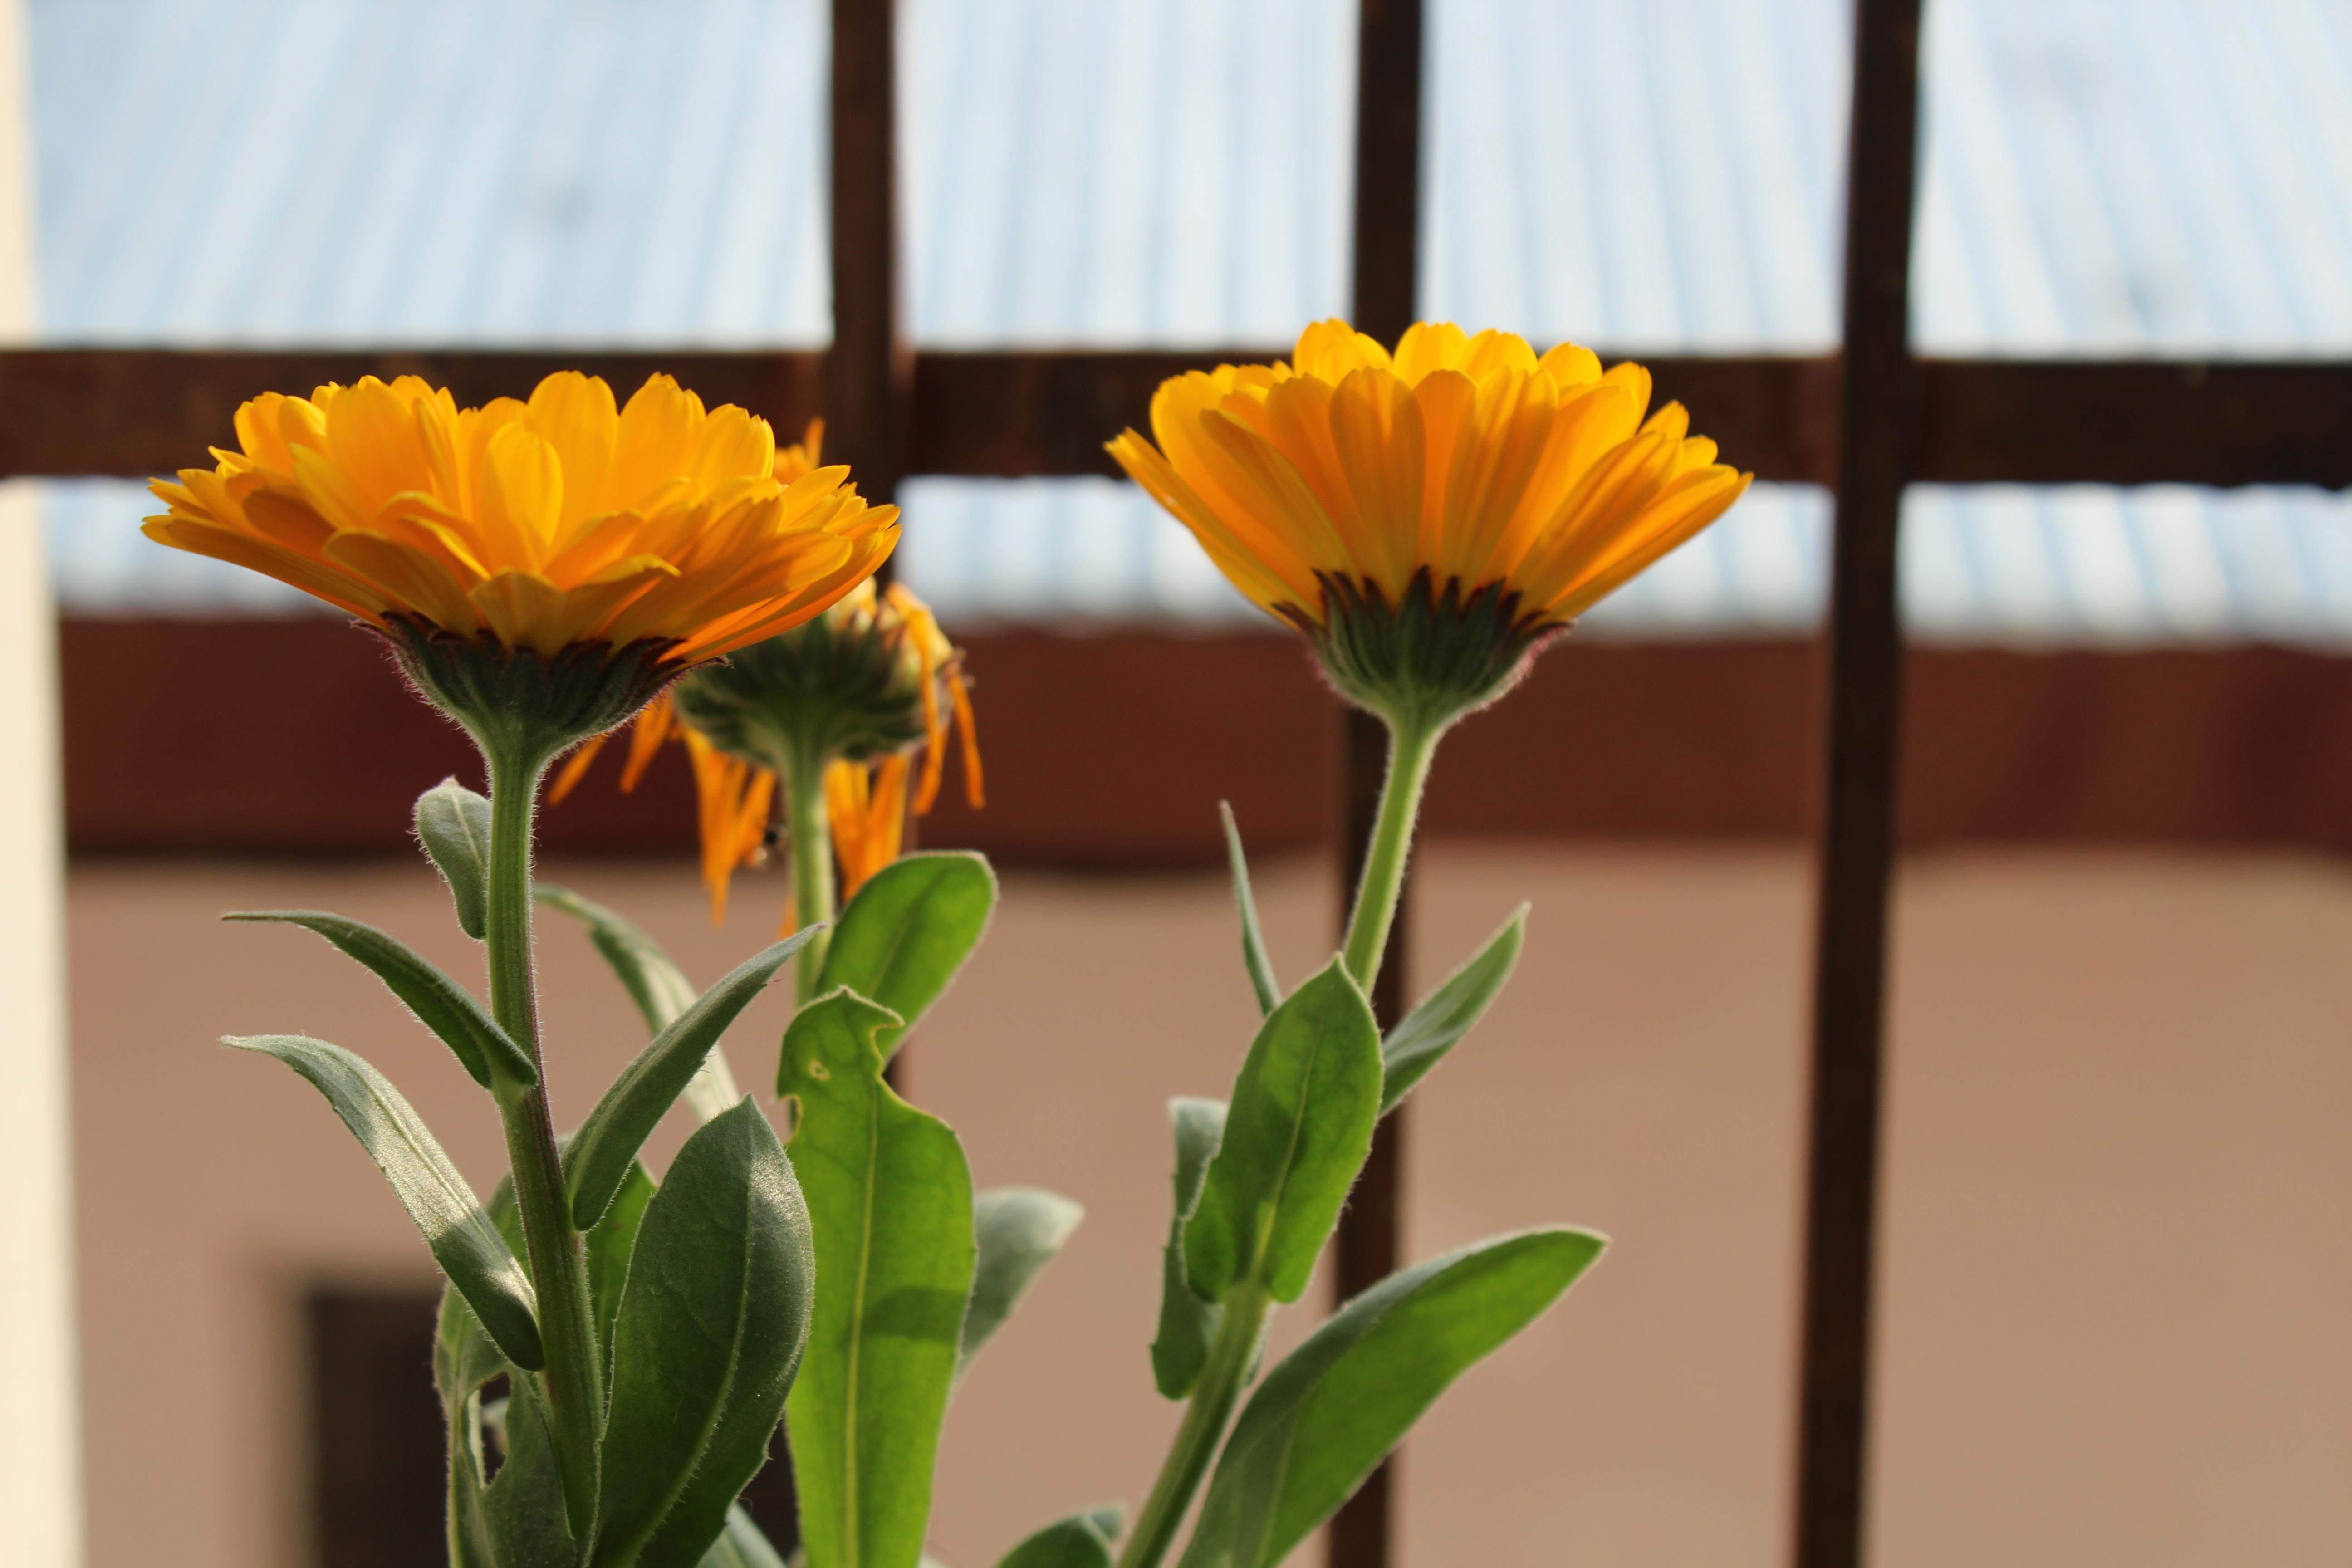 Flower plantation at DLS